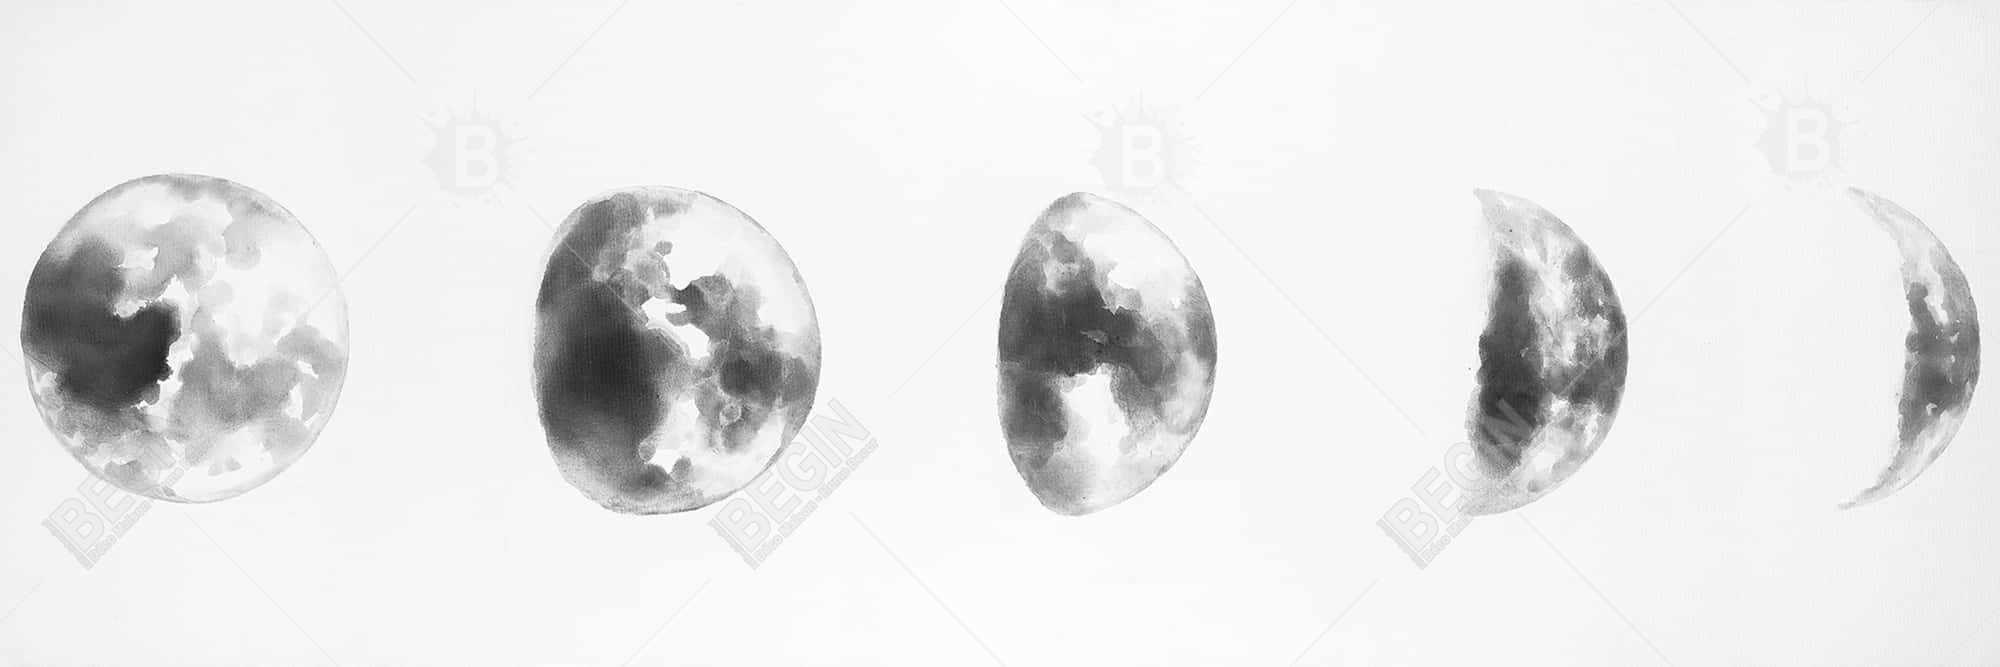 Black and white eclipse